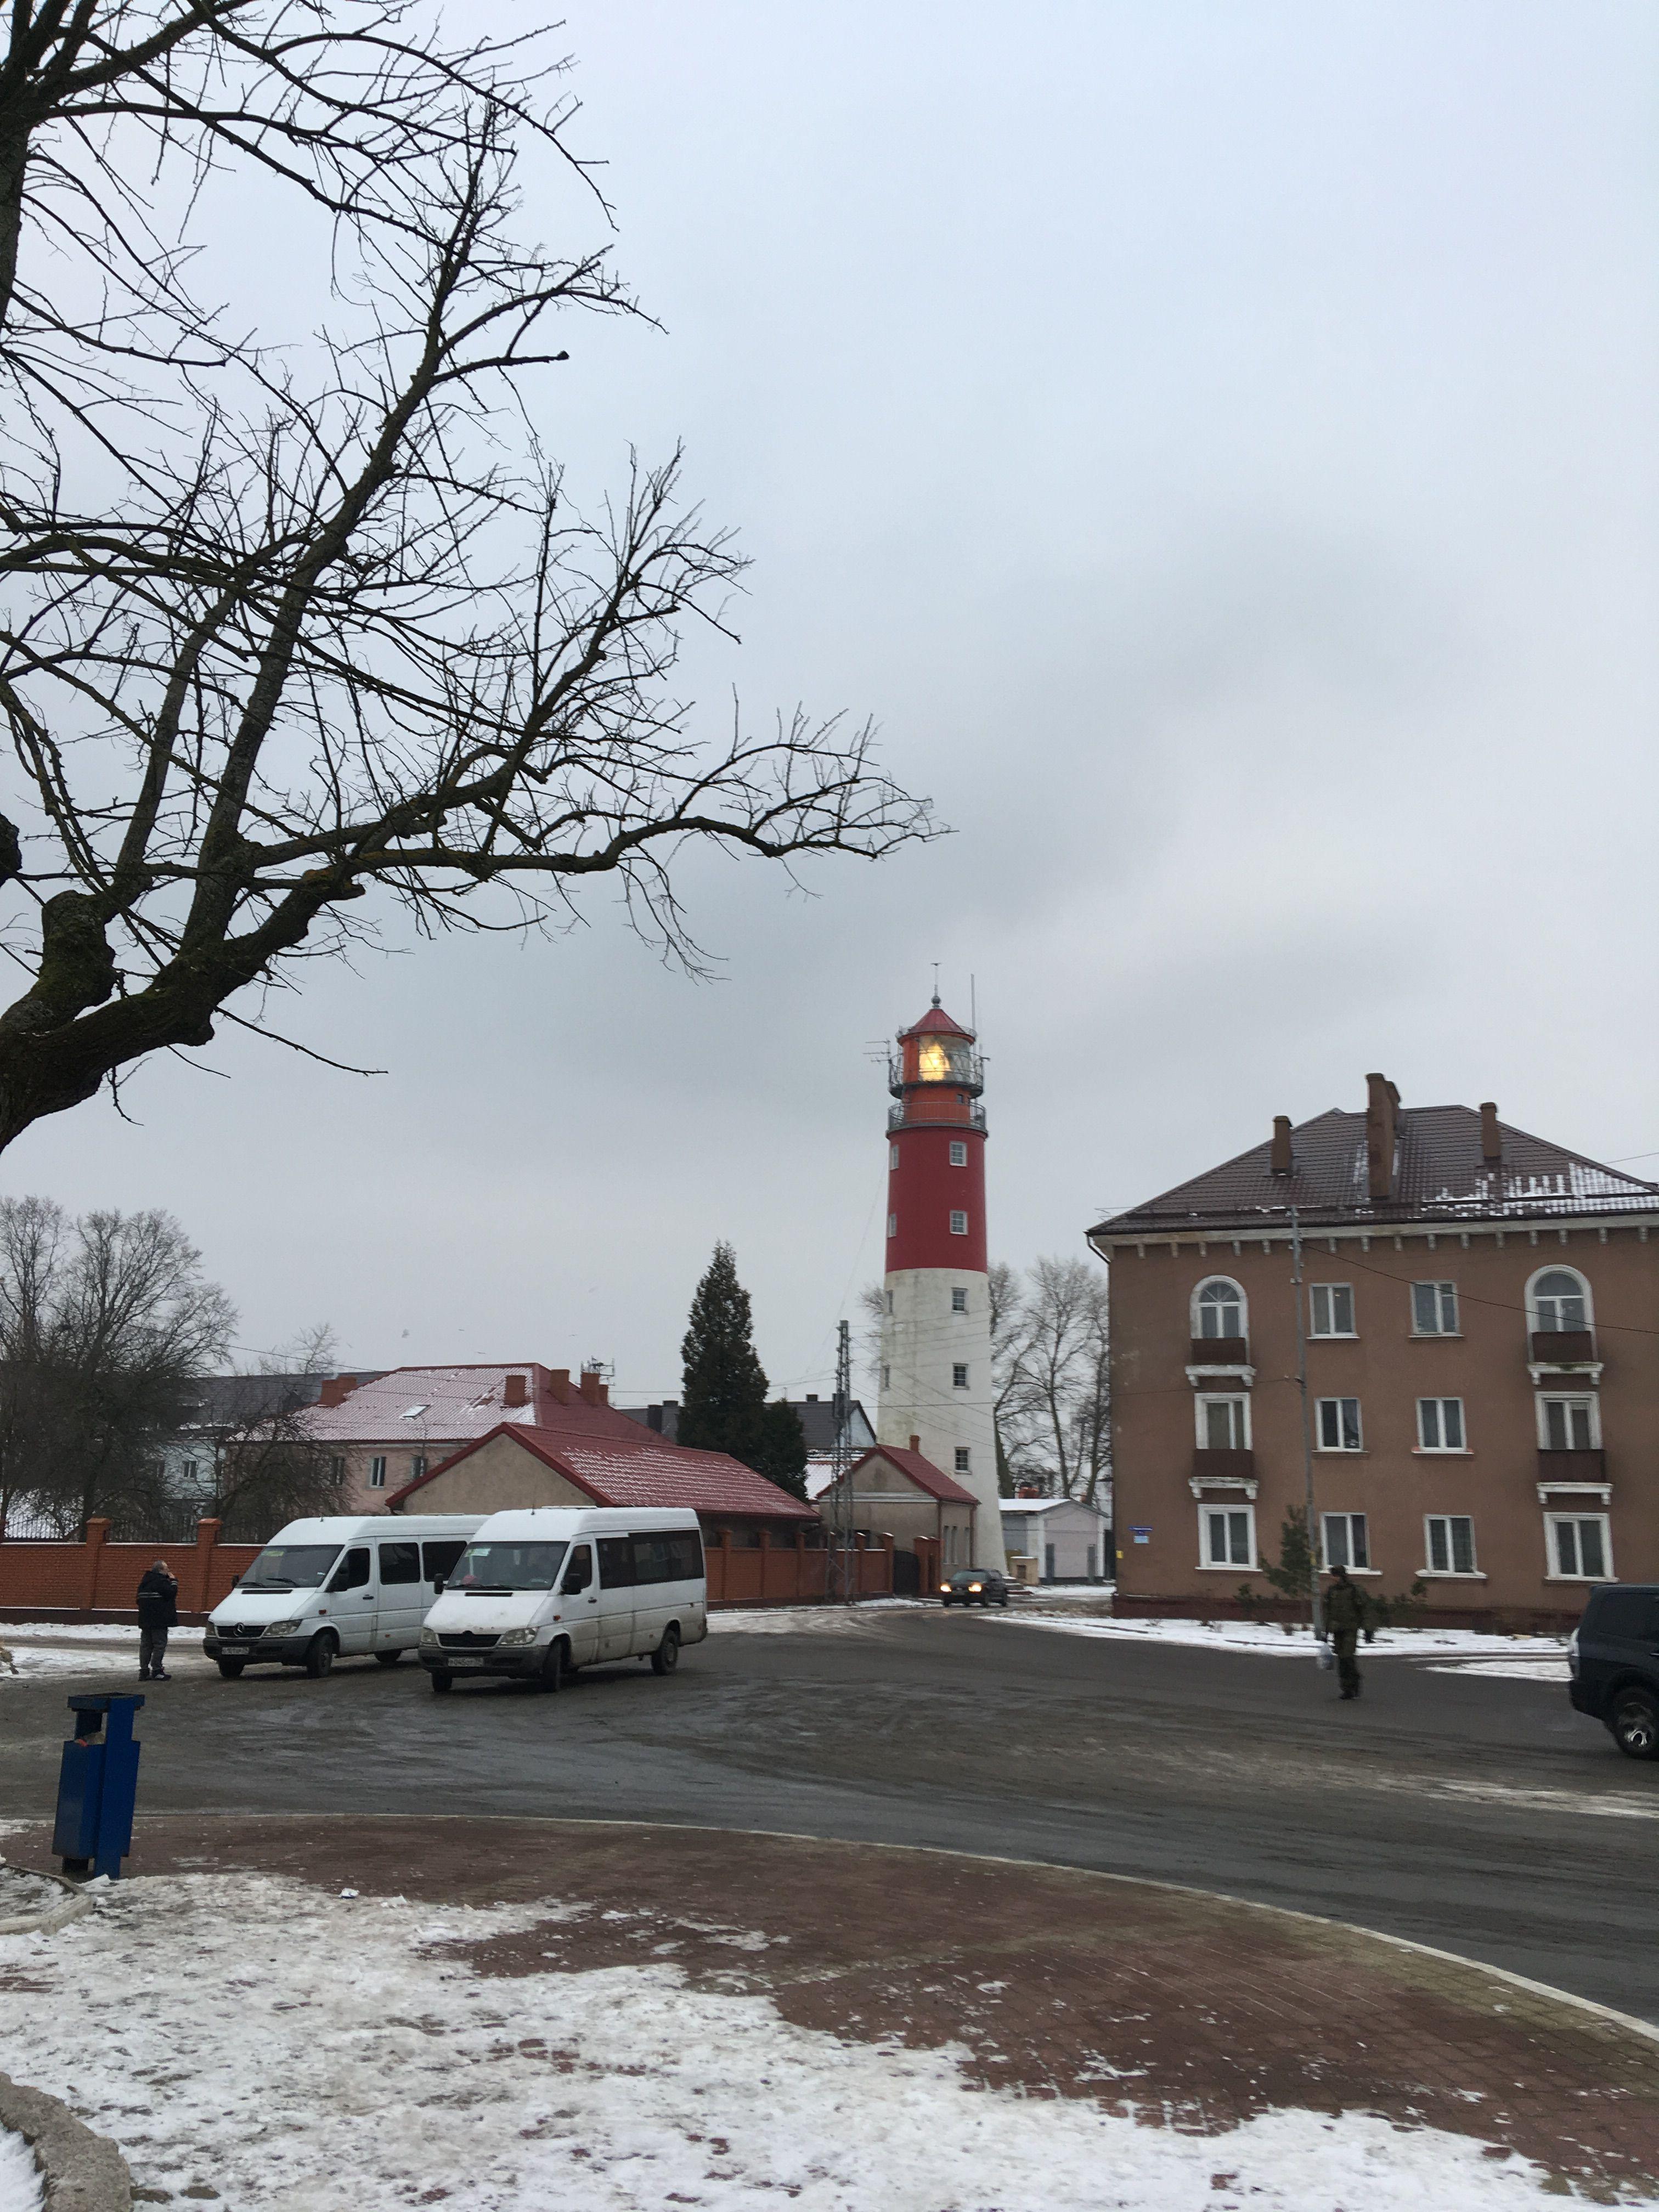 Маяк в Балтийске. Фото: Vladimir Shveda